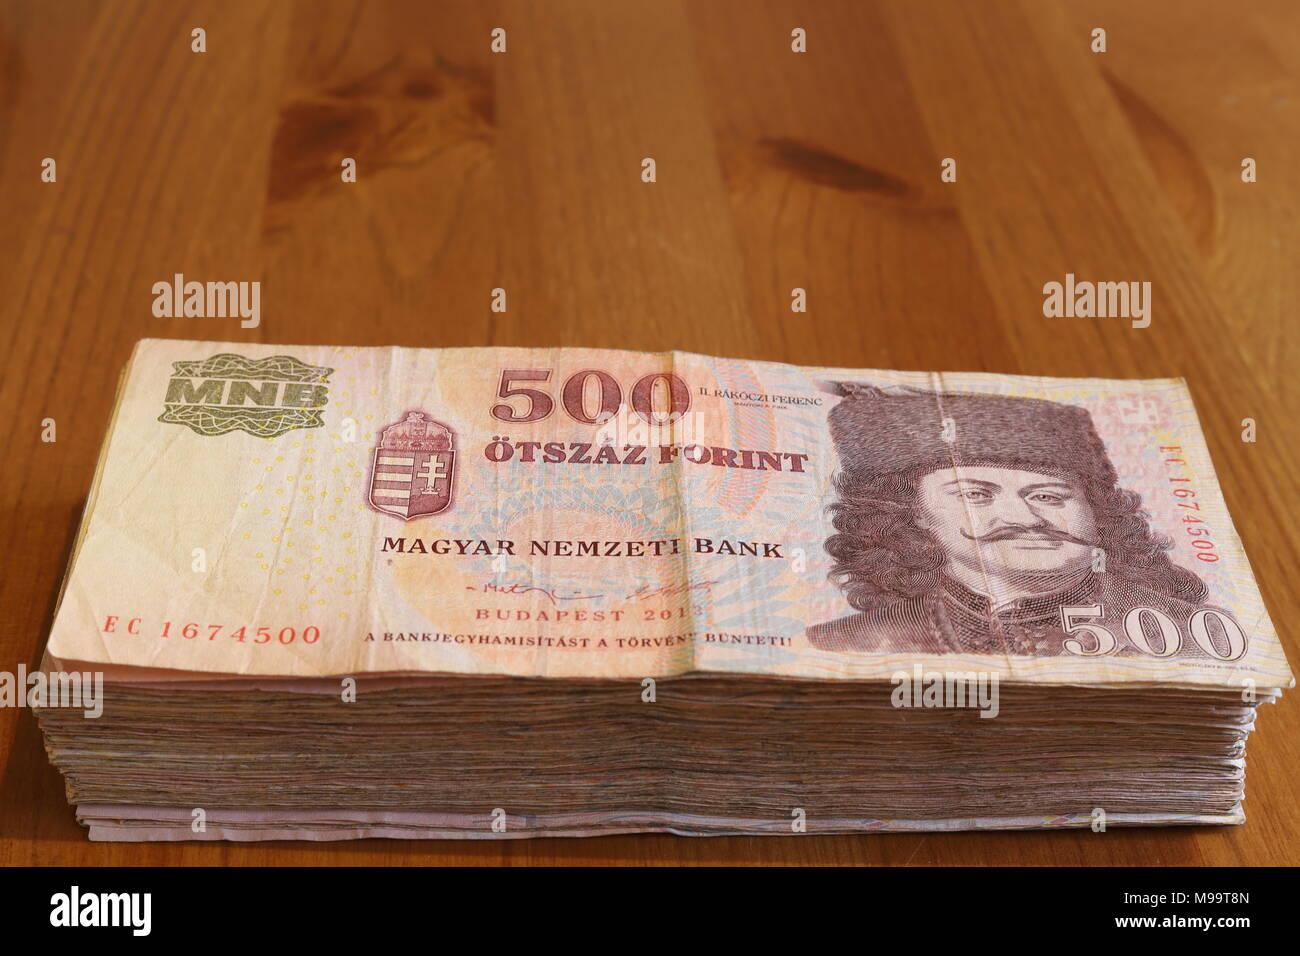 Hungarian Money Stockfotos & Hungarian Money Bilder - Alamy